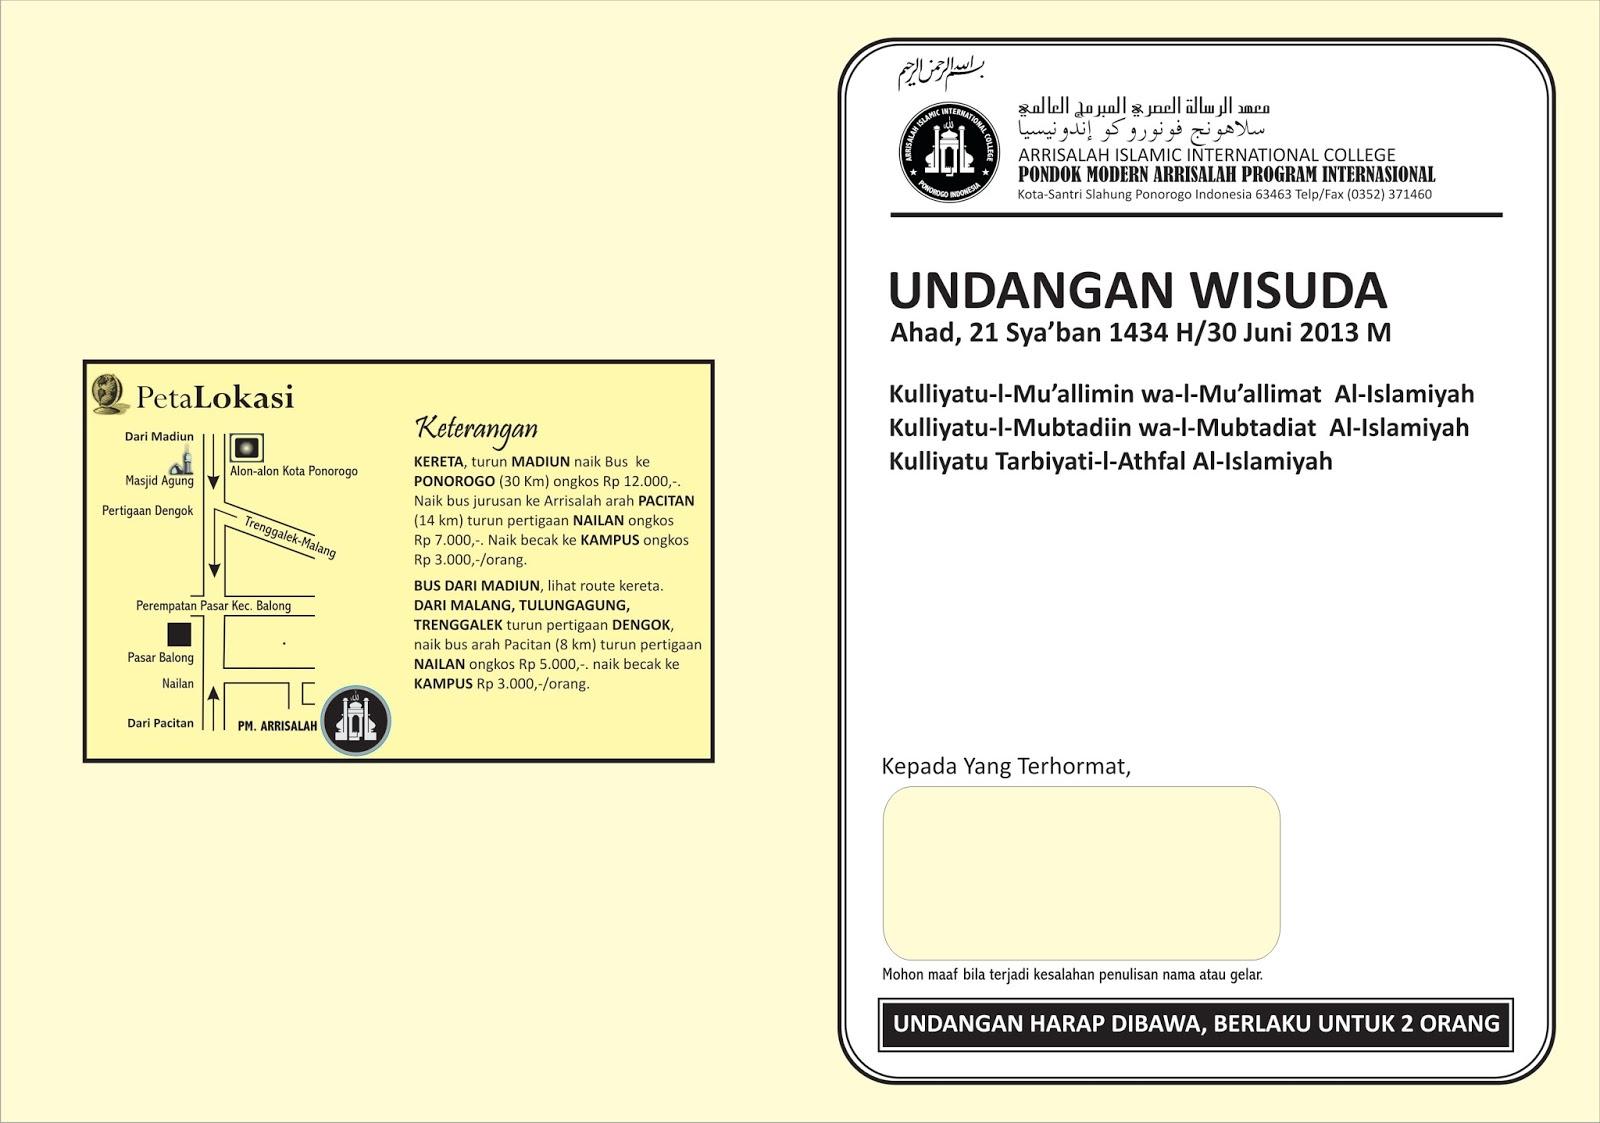 Download image Contoh Undangan Wisuda Sederhana PC, Android, iPhone ...